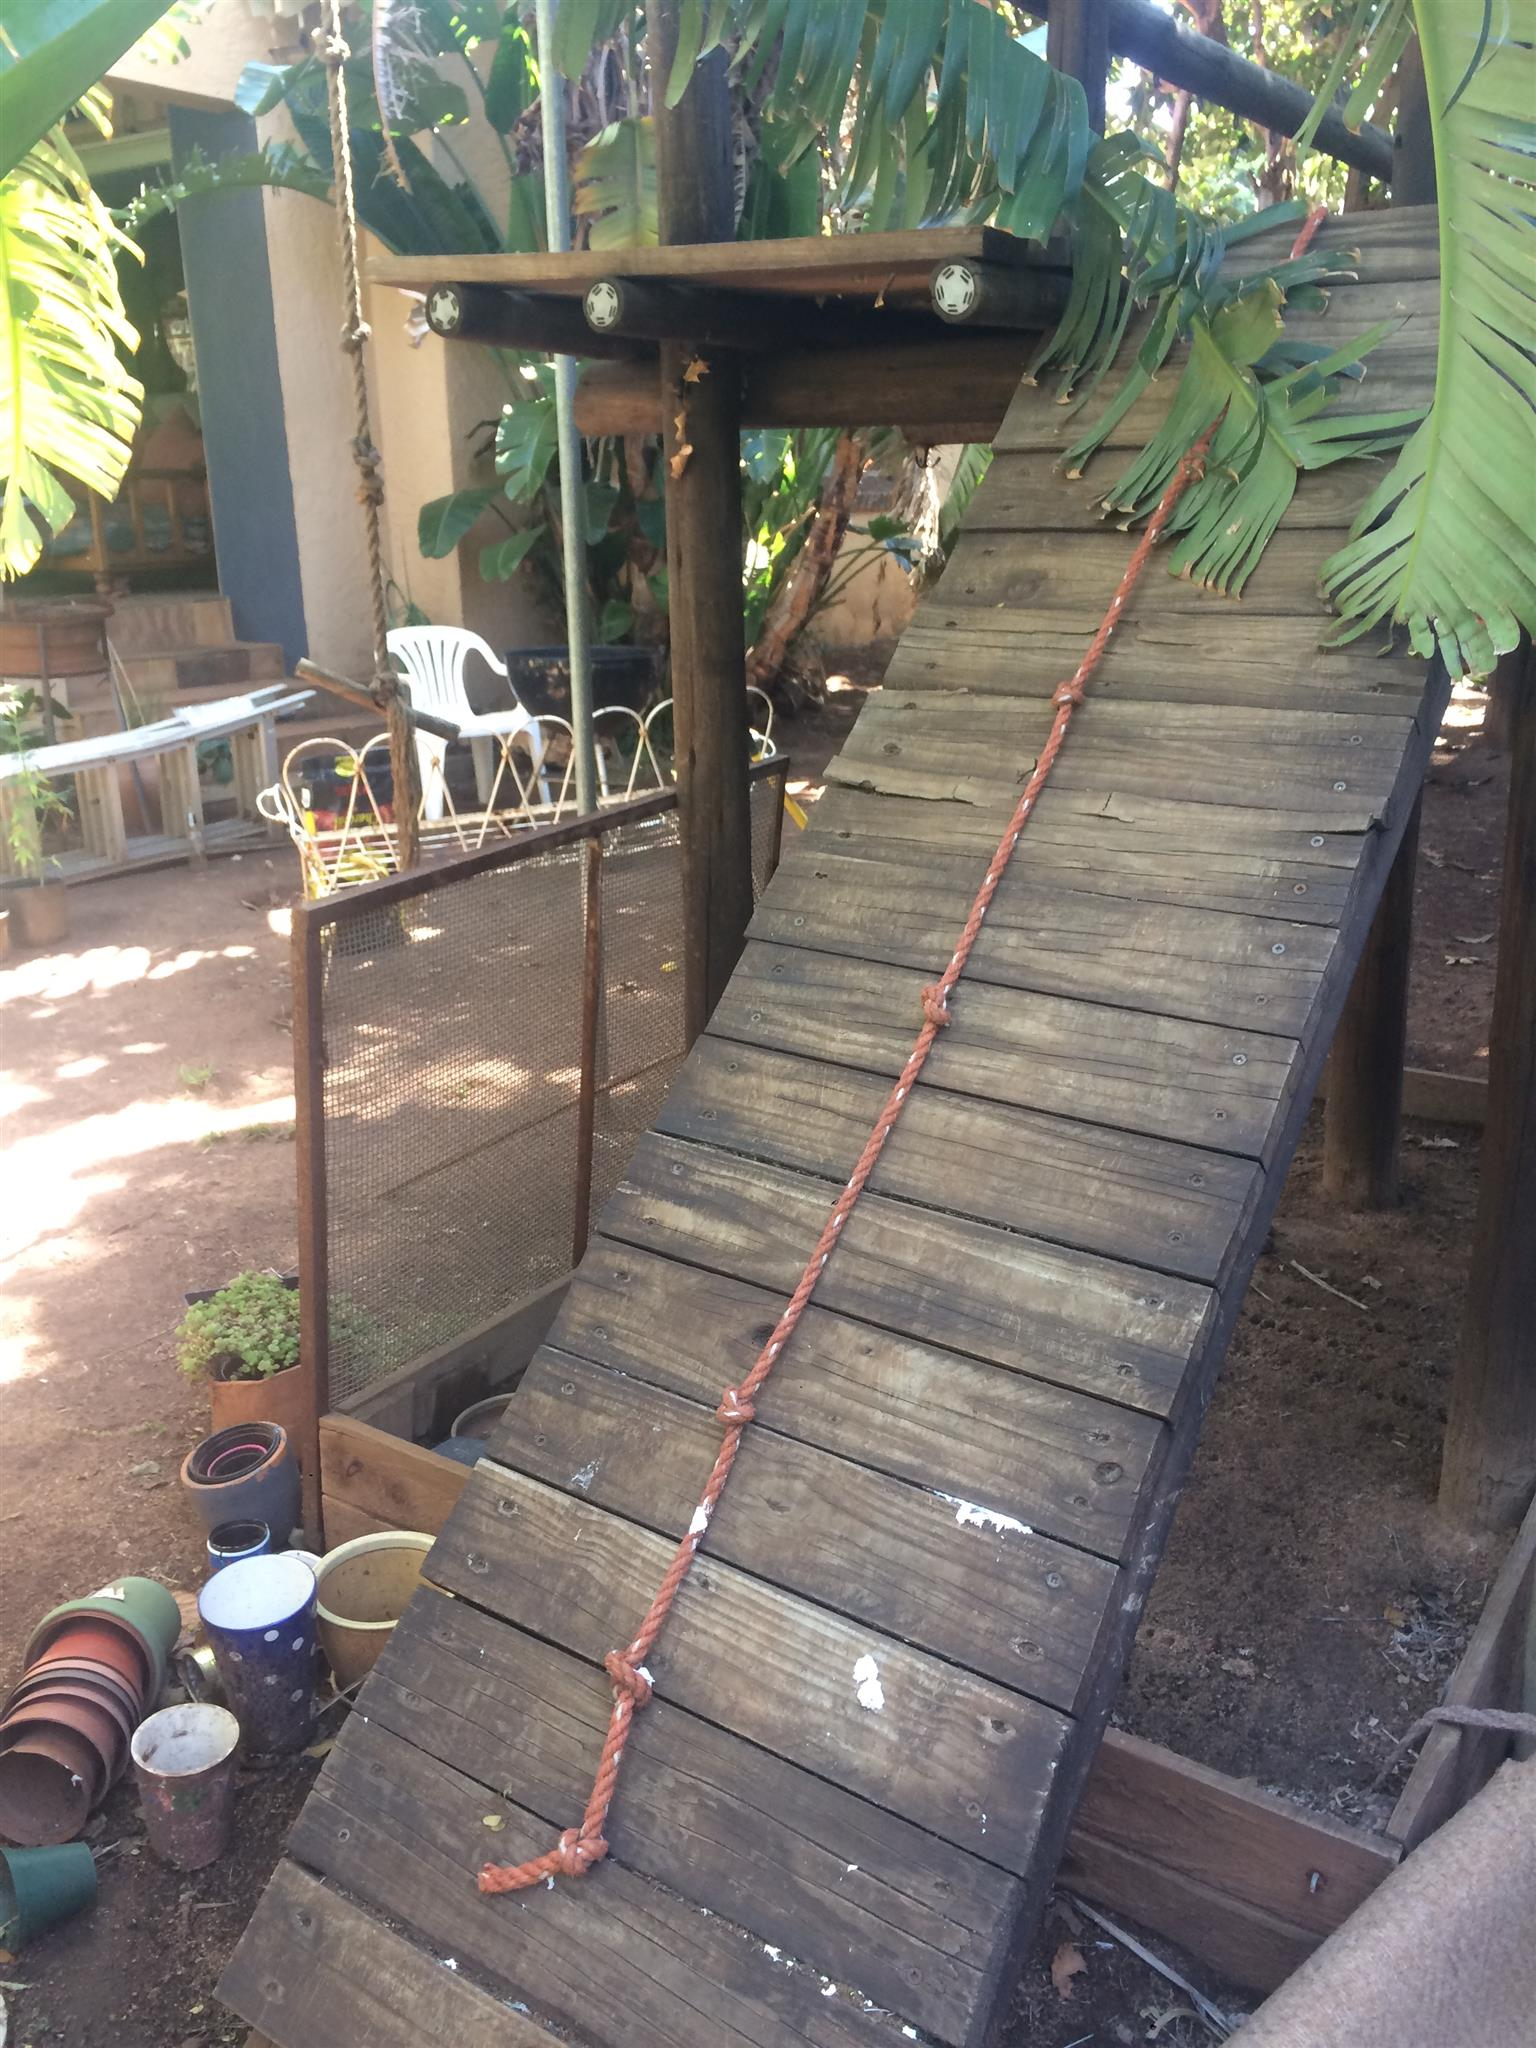 Jungle gym, massive wooden